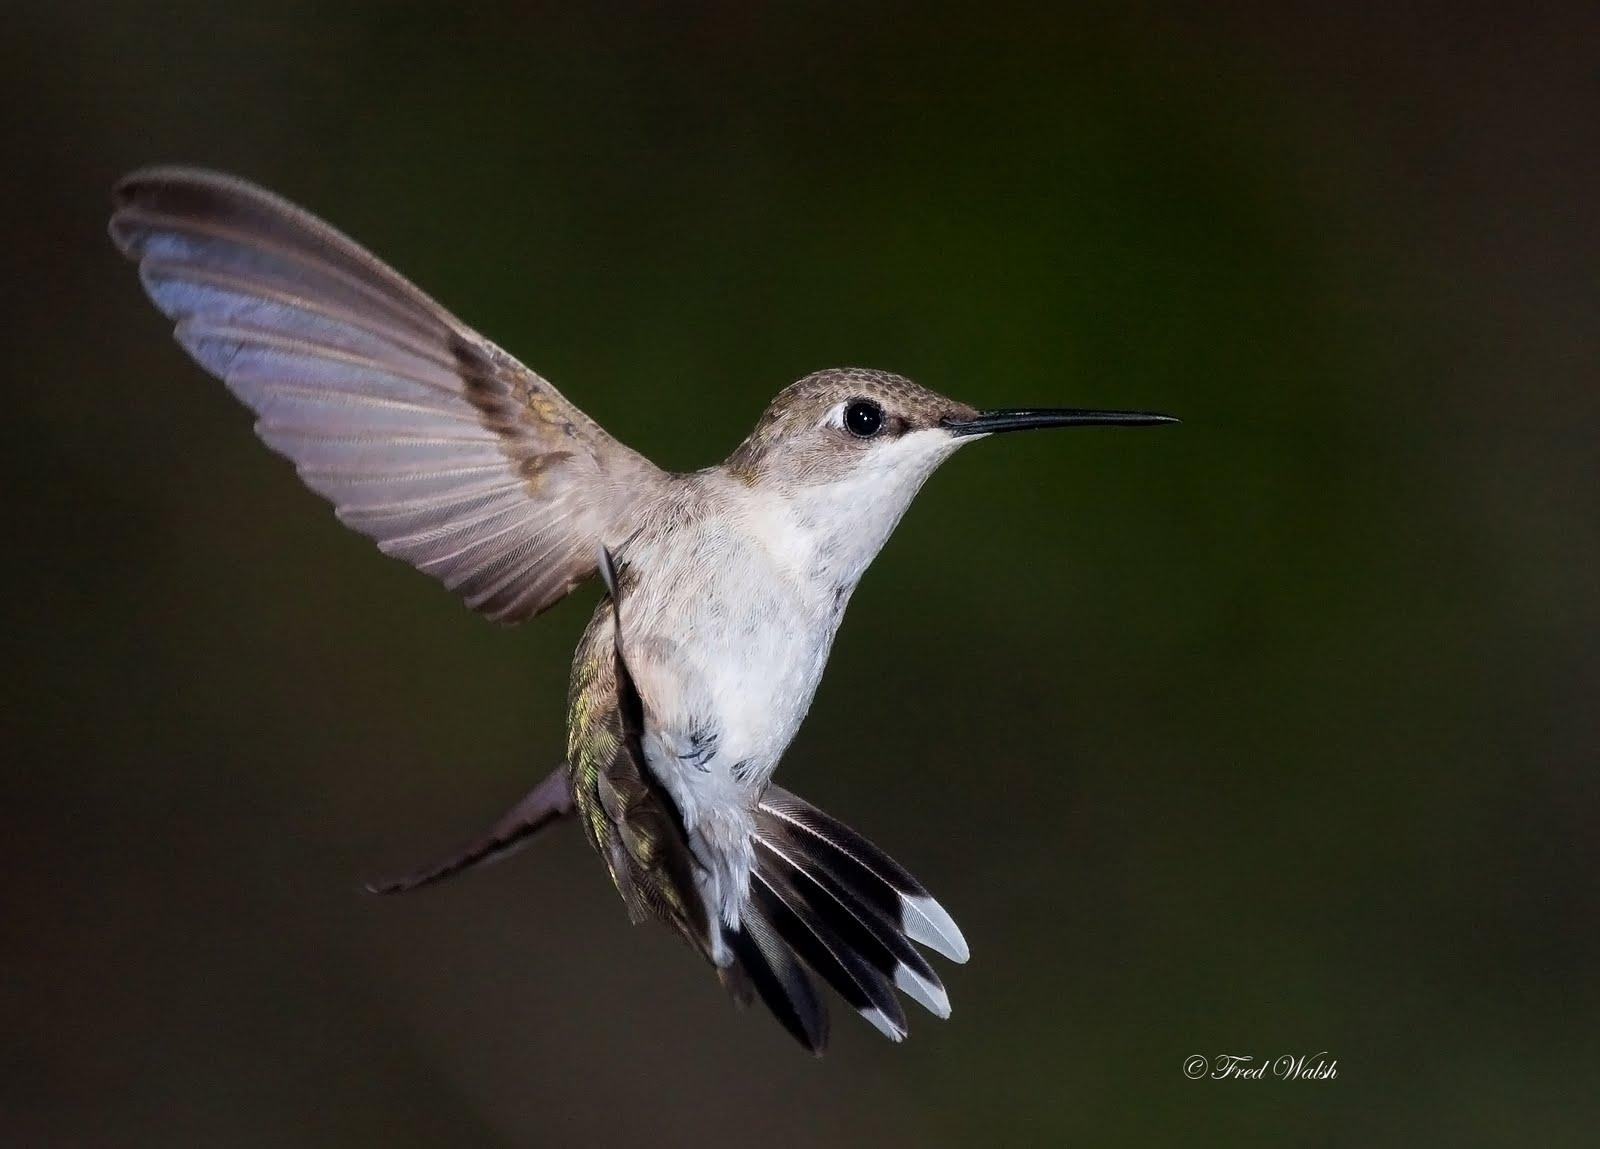 fred walsh photos: Ruby Throated Hummingbird, female